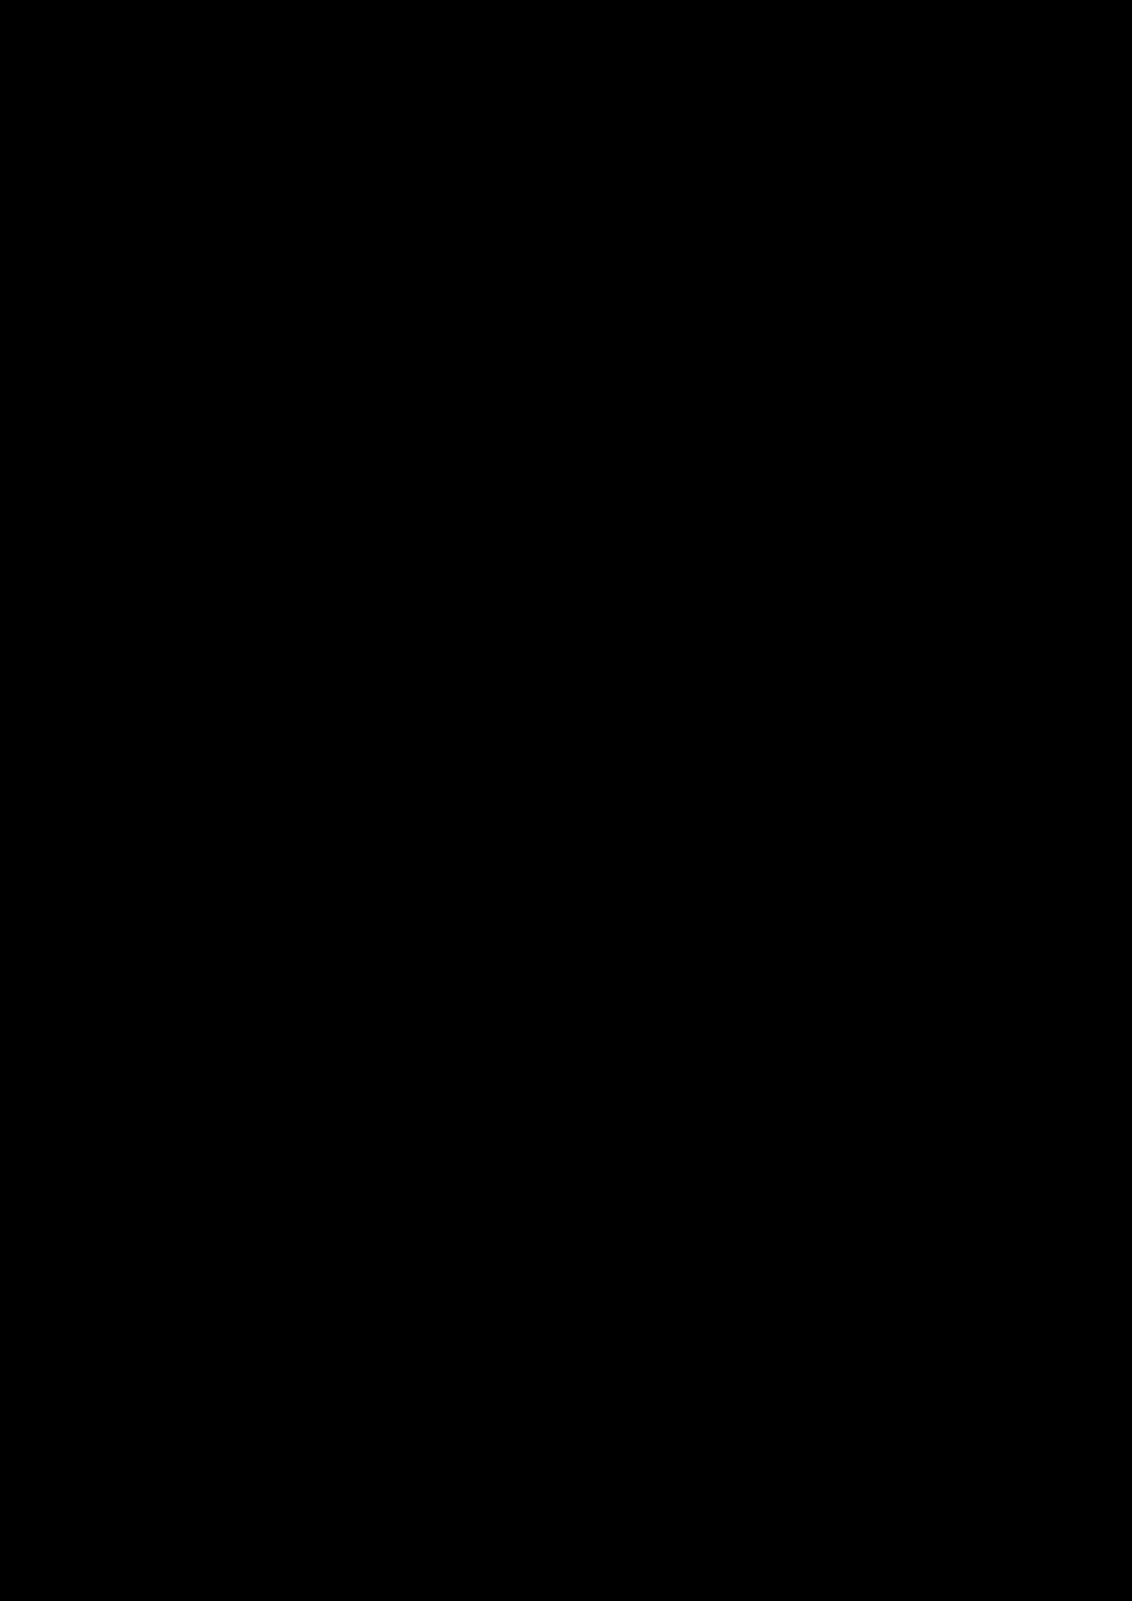 Belyiy sokol slide, Image 123